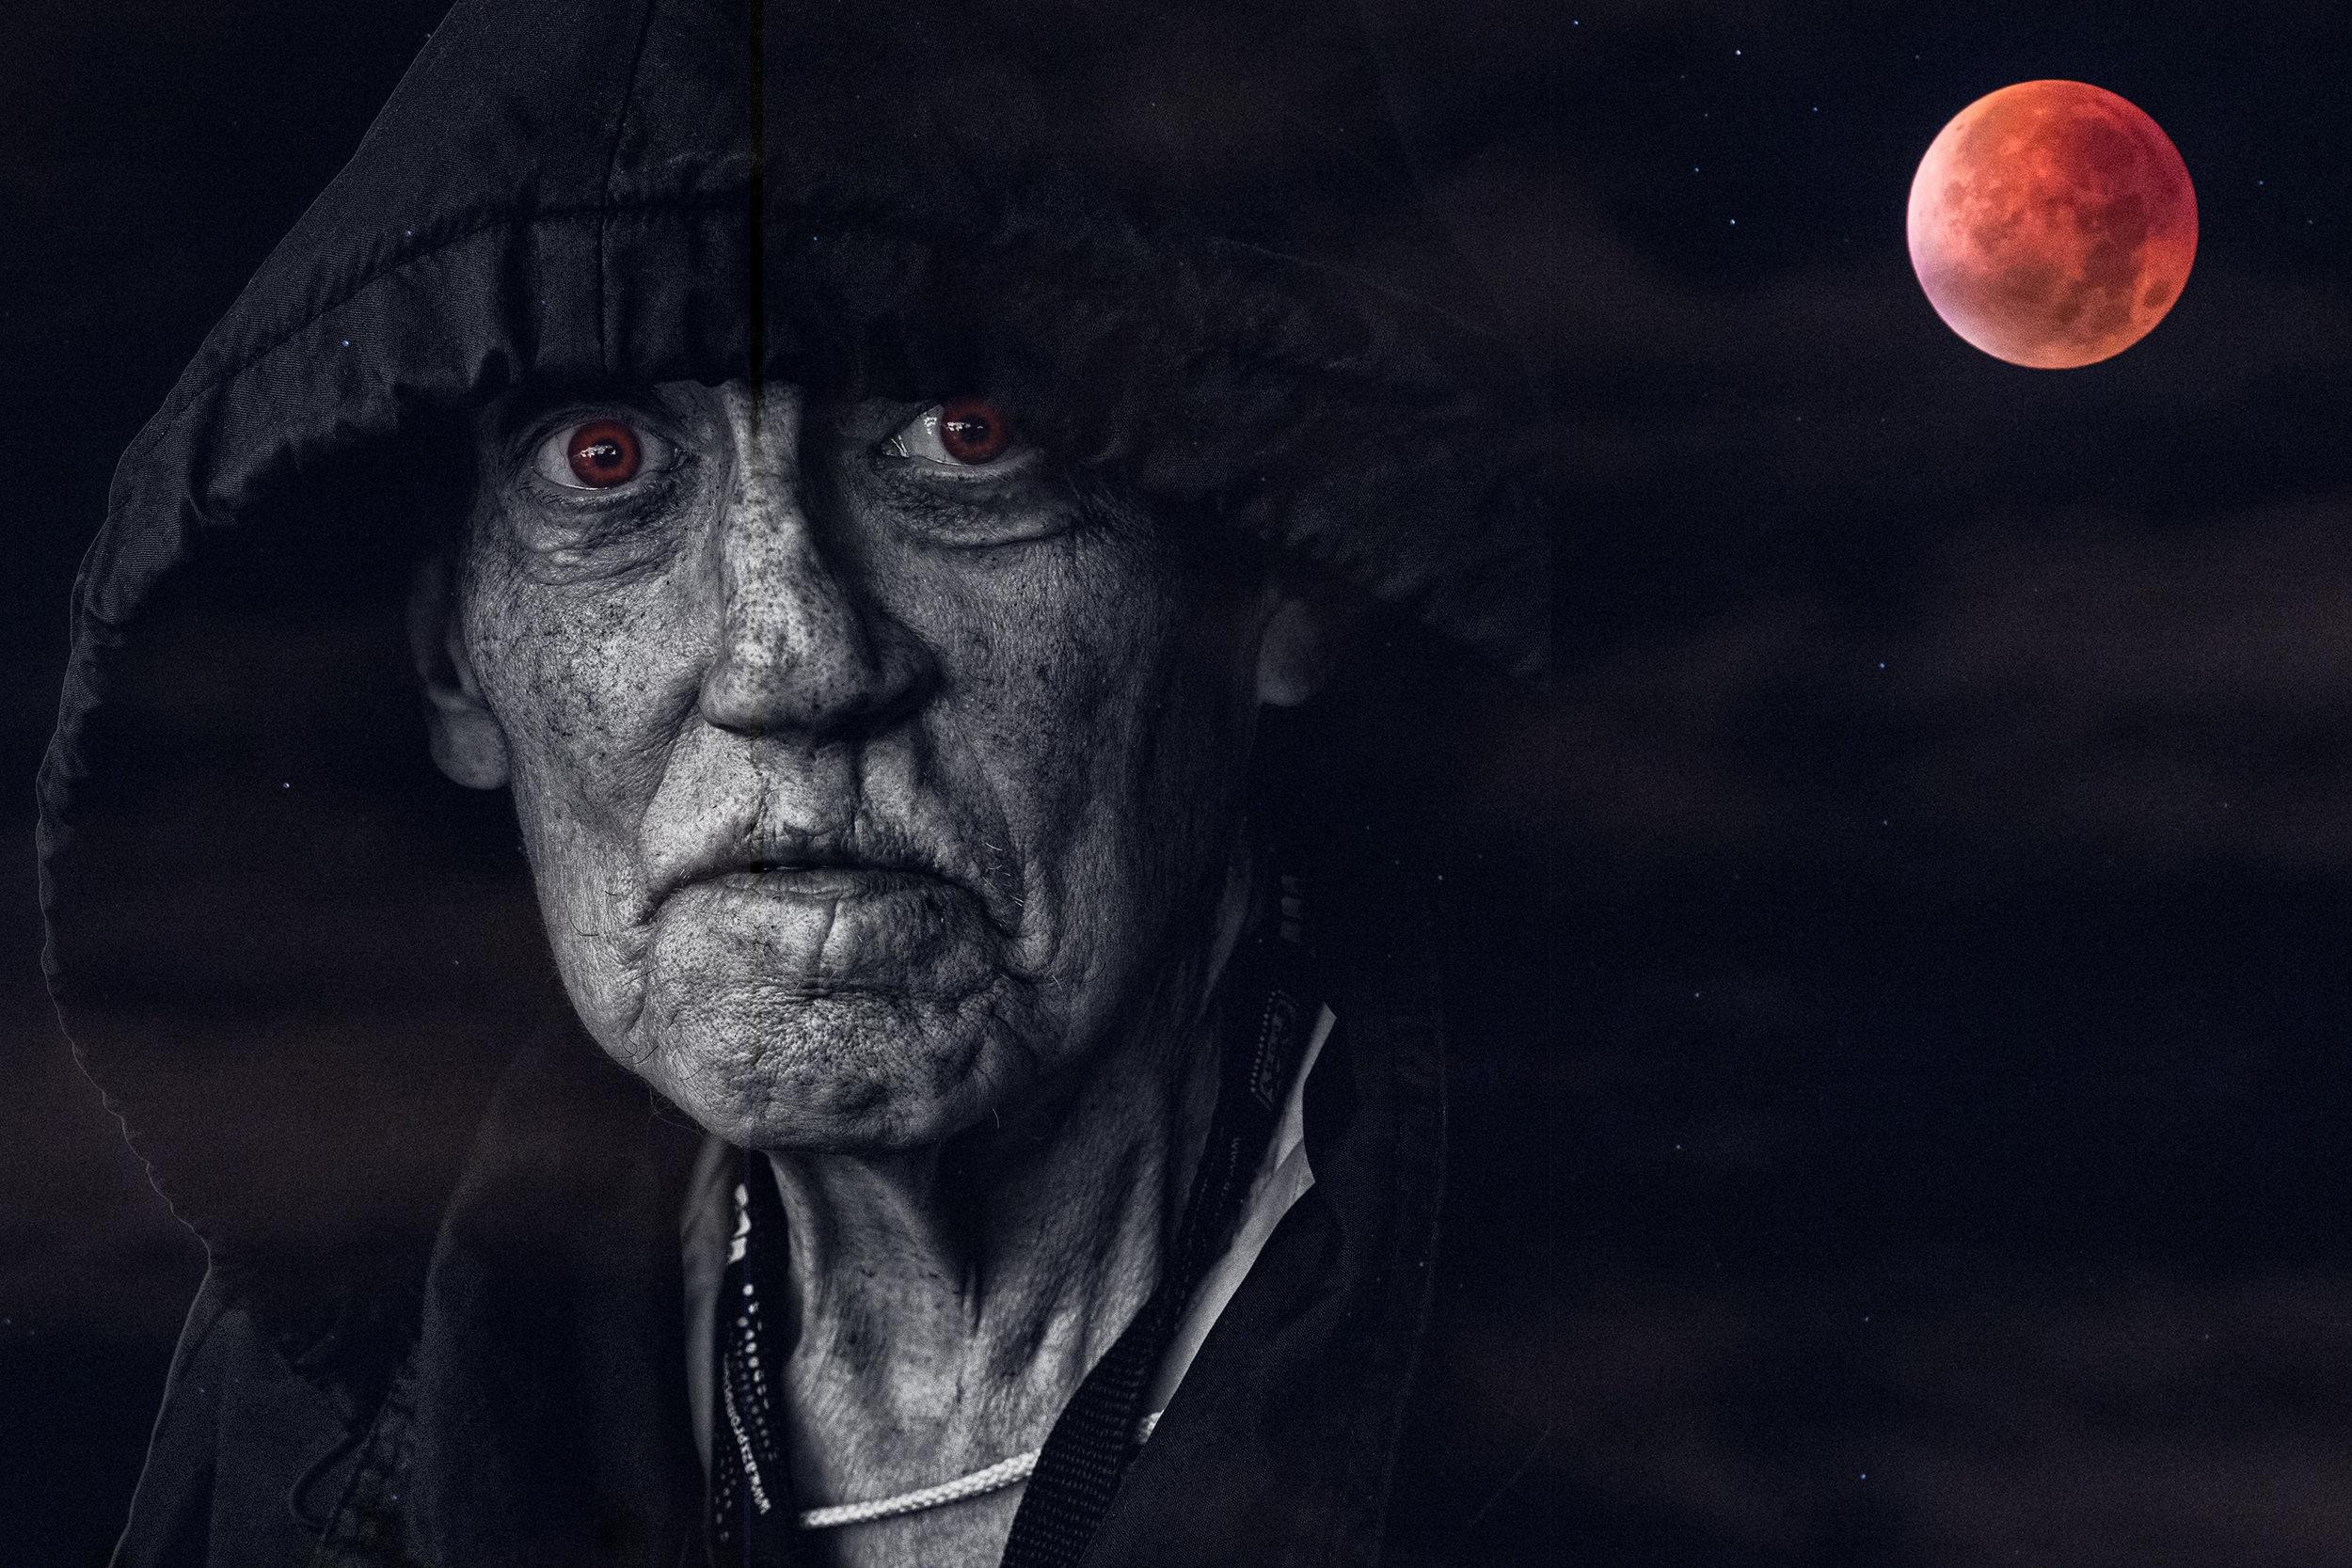 IT's WEDNESDAY NIGHT! - horror // absurd // 10-minute read